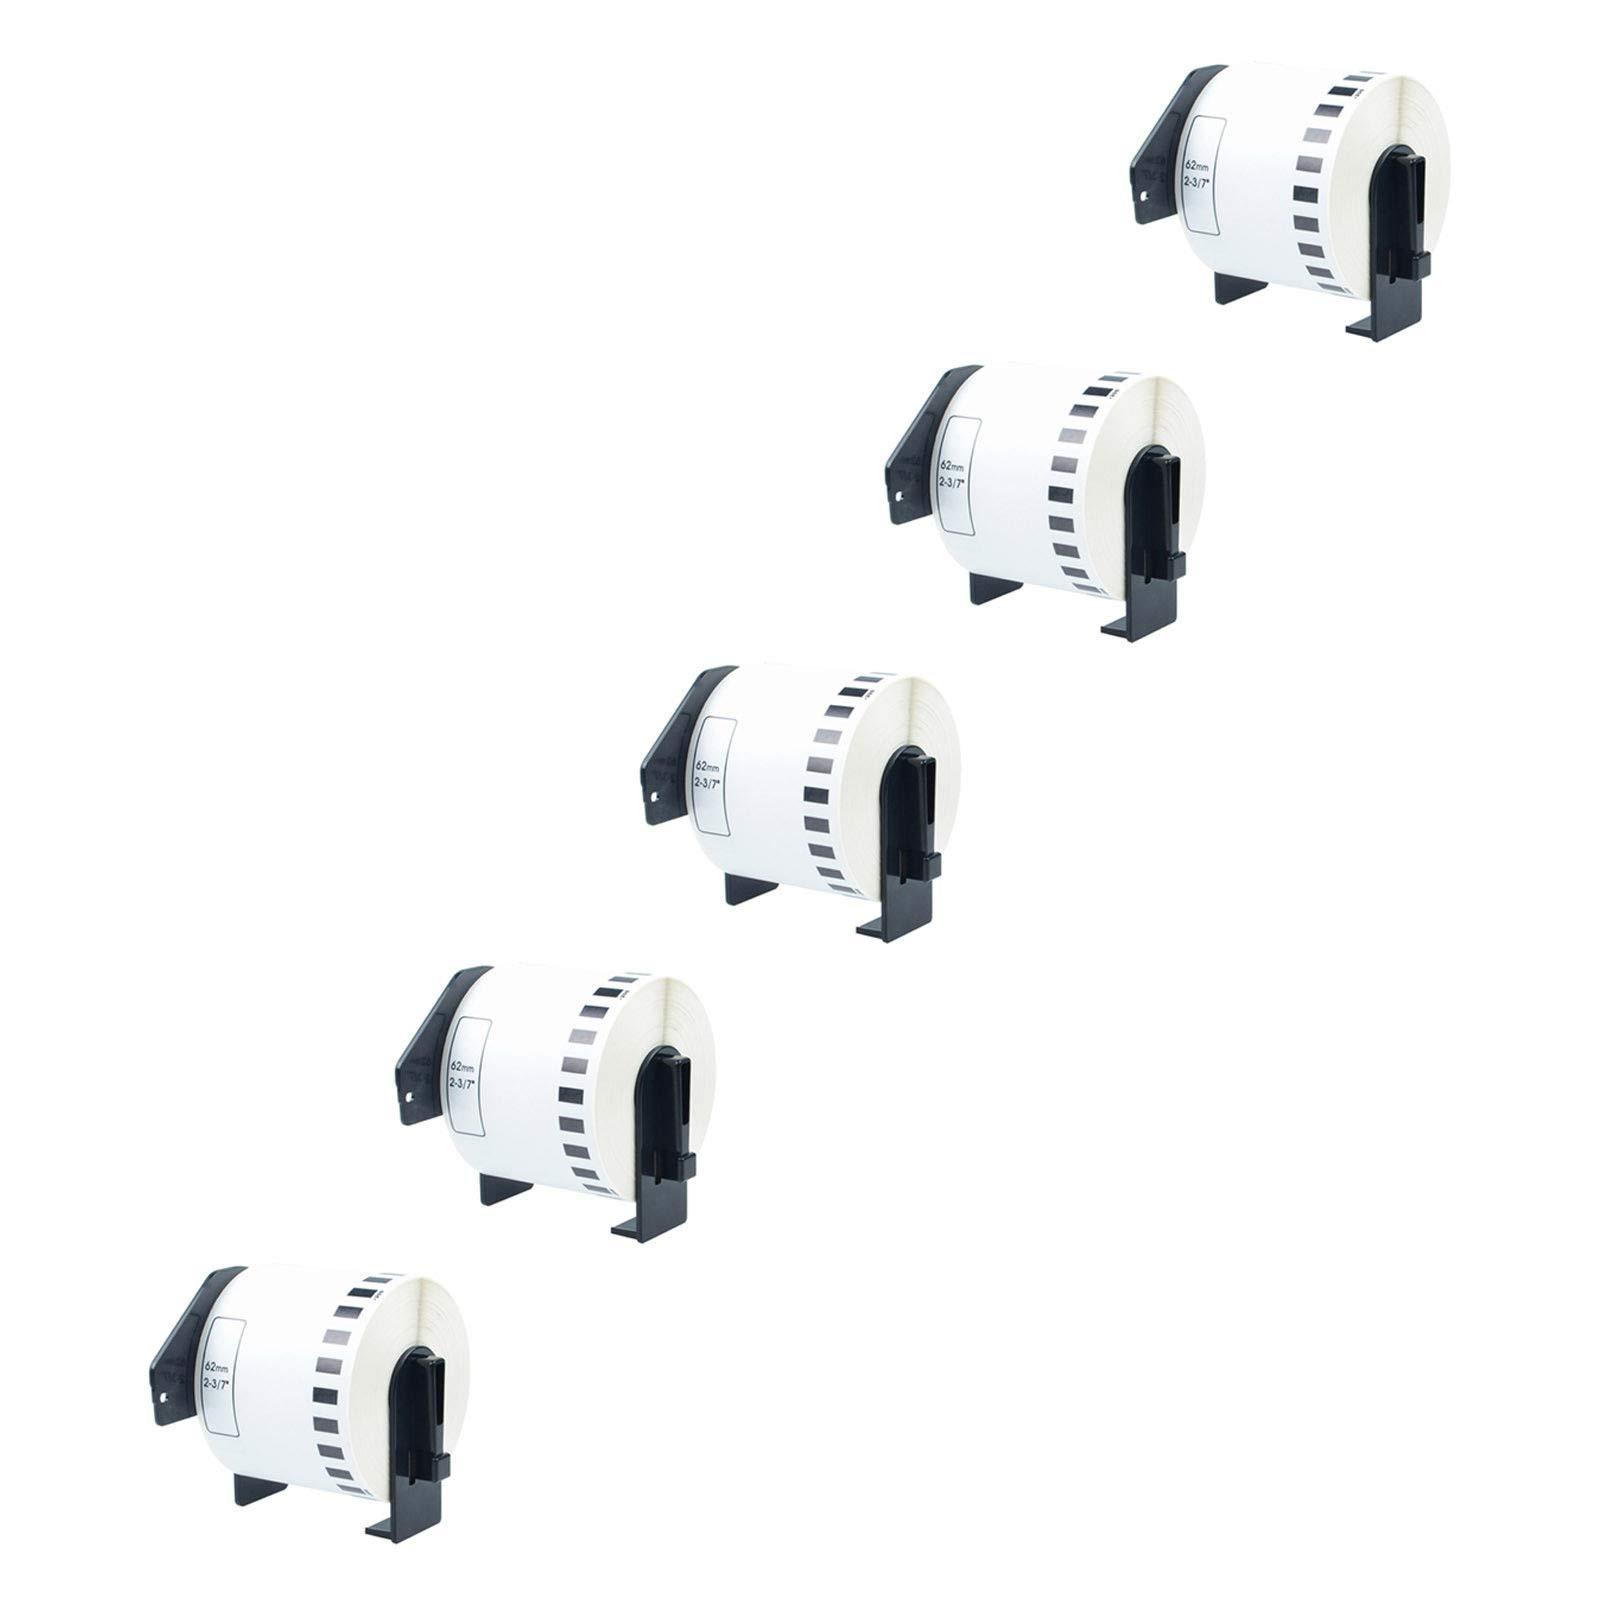 KCYMTONER 5 Roll of Compatible Brother DK-2205 DK2205 White Label Continuous Paper 62mm x 30.48M 2-3/7'' x 100' for P-Touch Q Touch QL-500 QL-570 QL-650 QL710W QL720 QL-1050N QL-1060 Series Printer